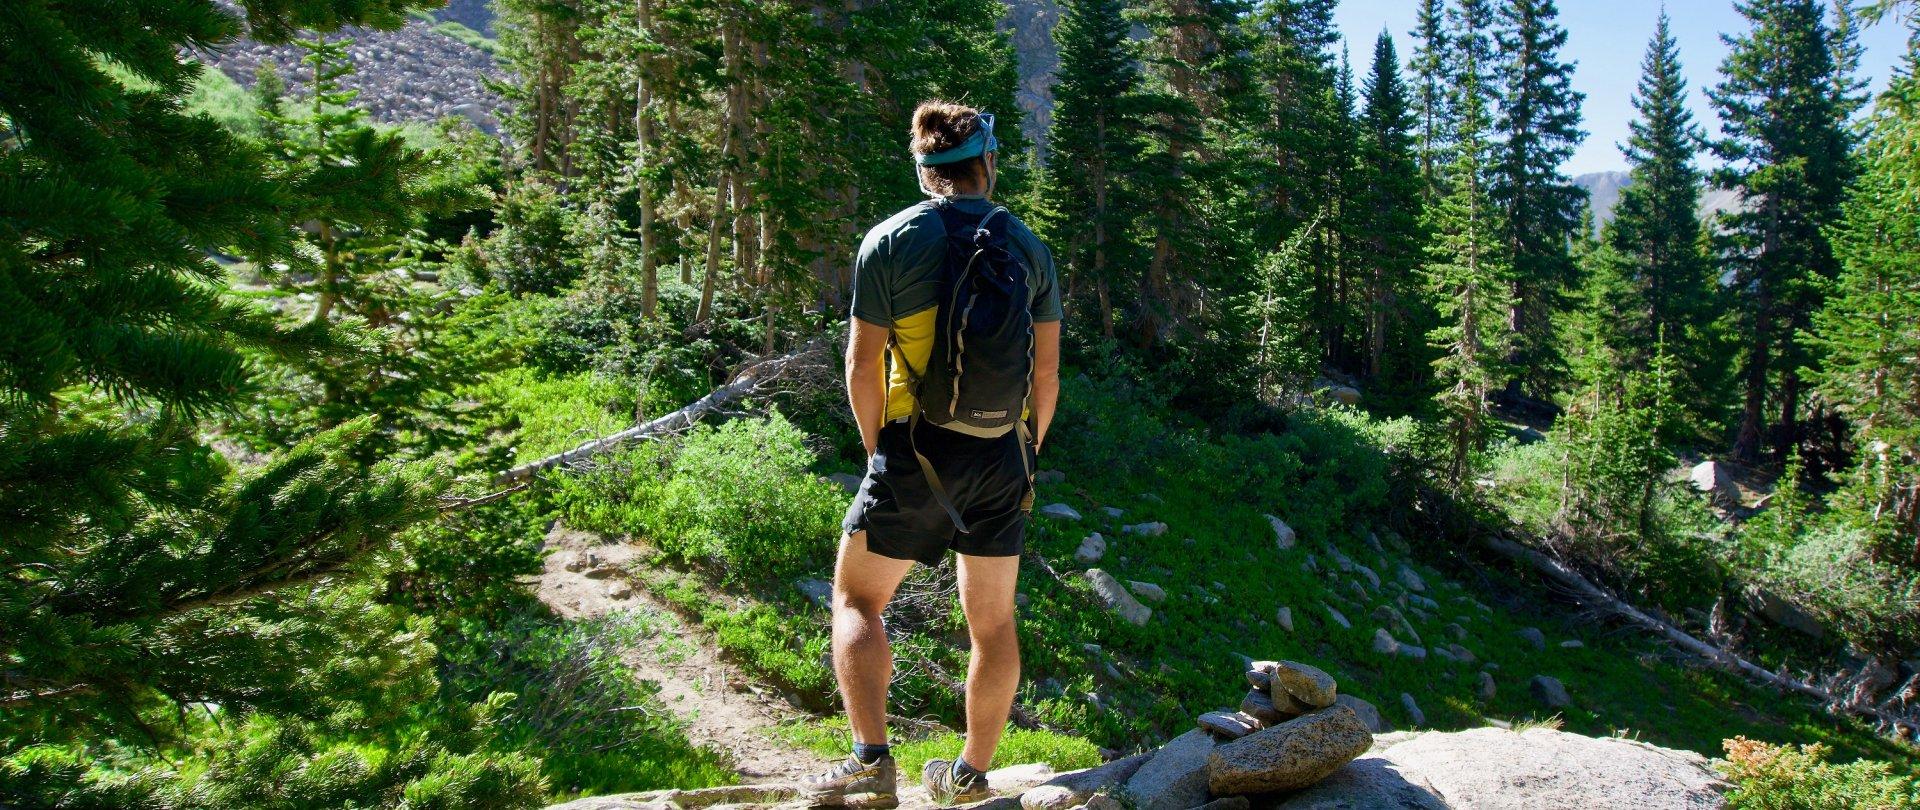 4 Tage Wandern im Schwarzwald